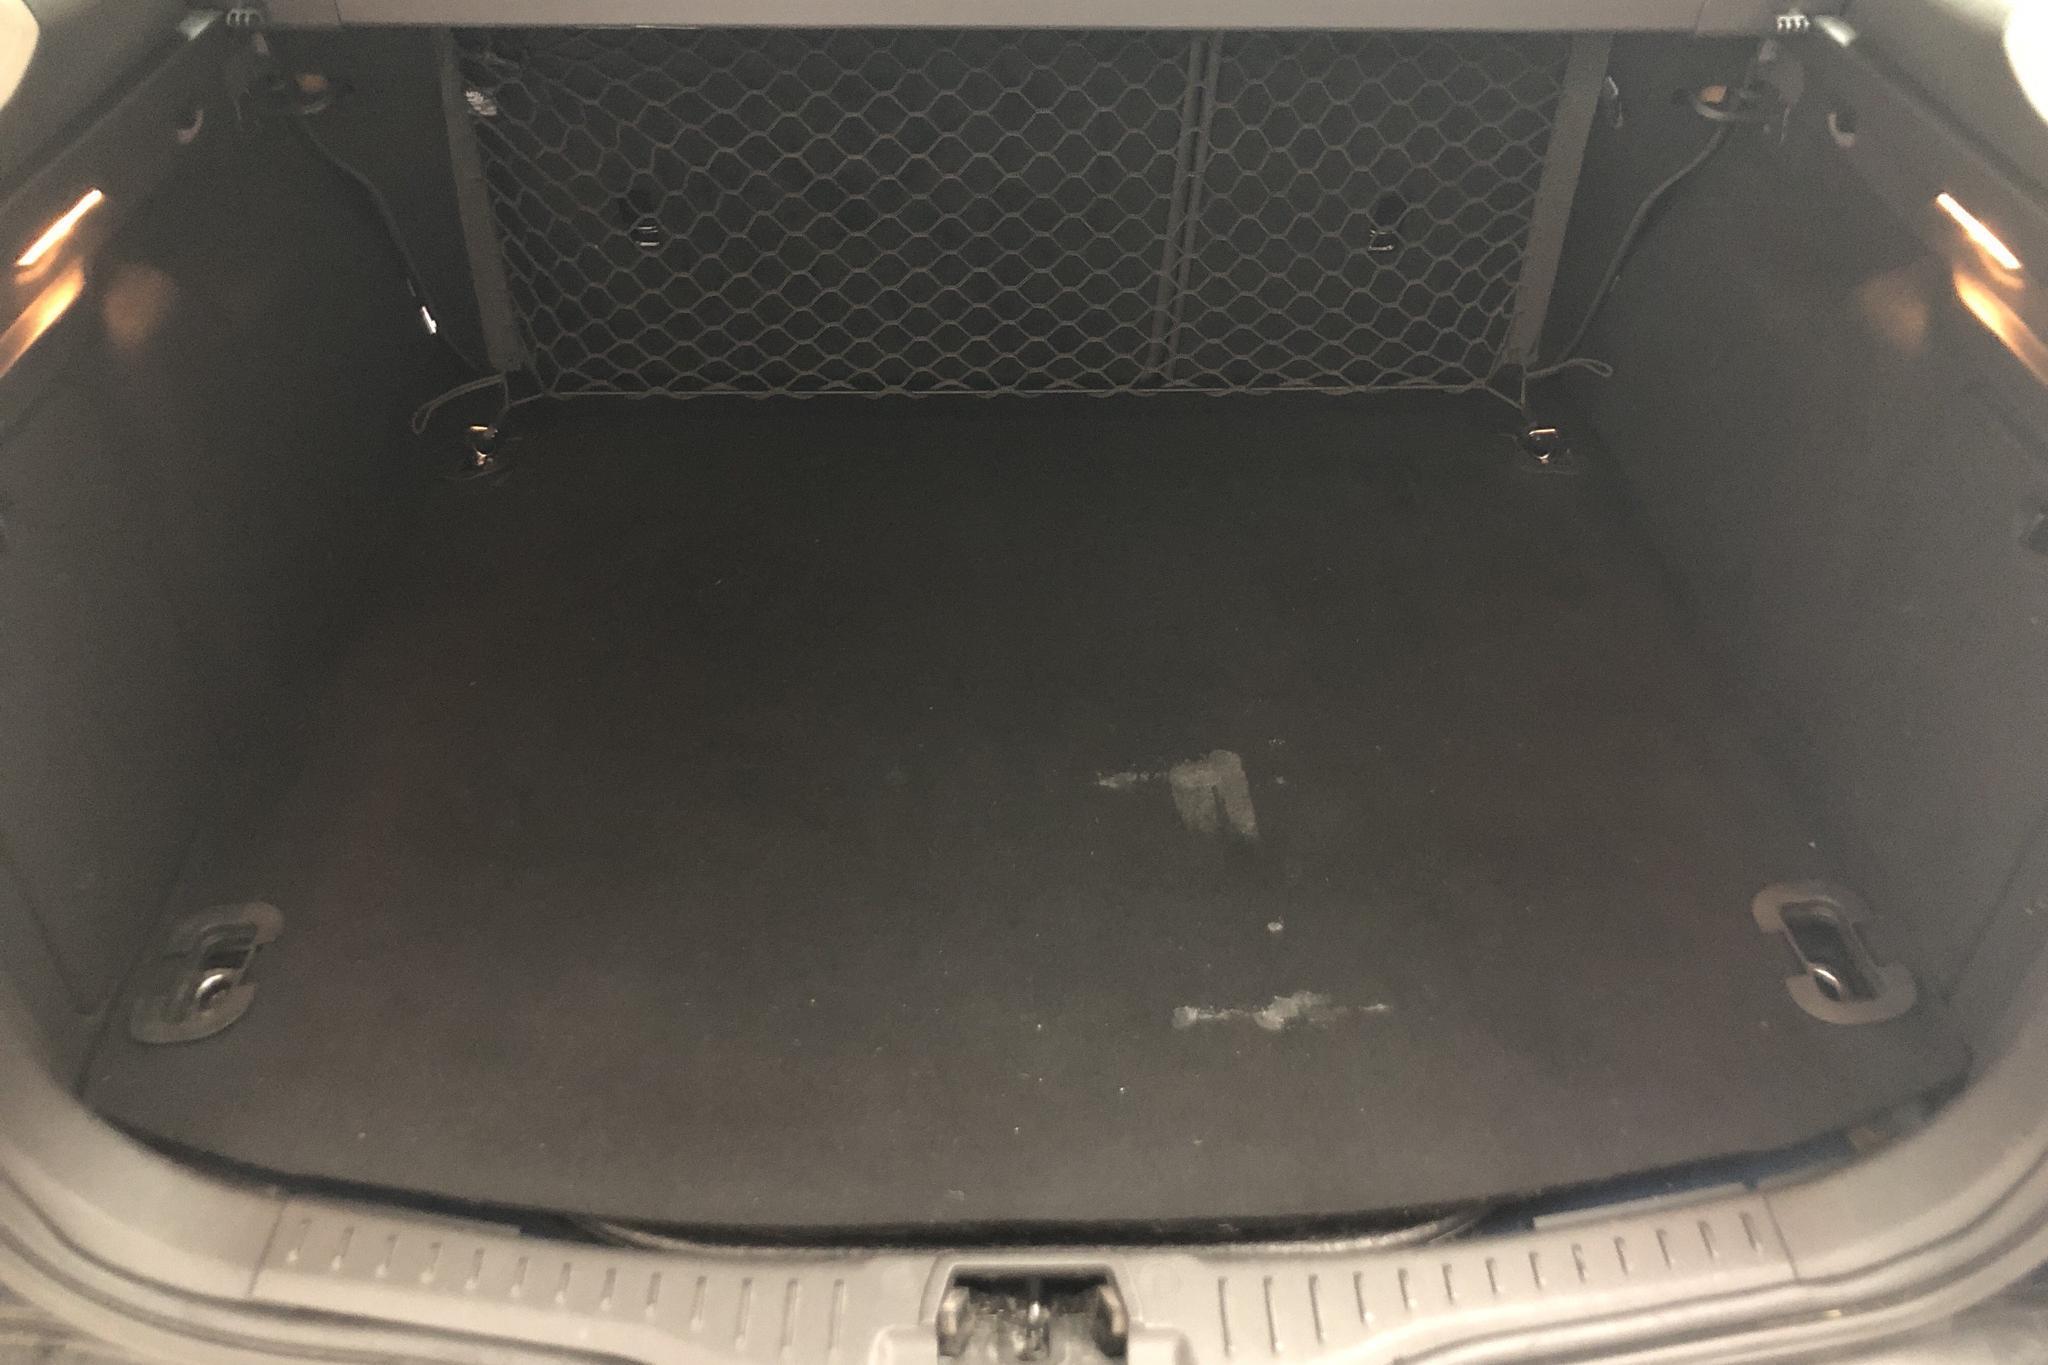 Ford Focus 1.6 TDCi Kombi (115hk) - 7 571 mil - Manuell - blå - 2012